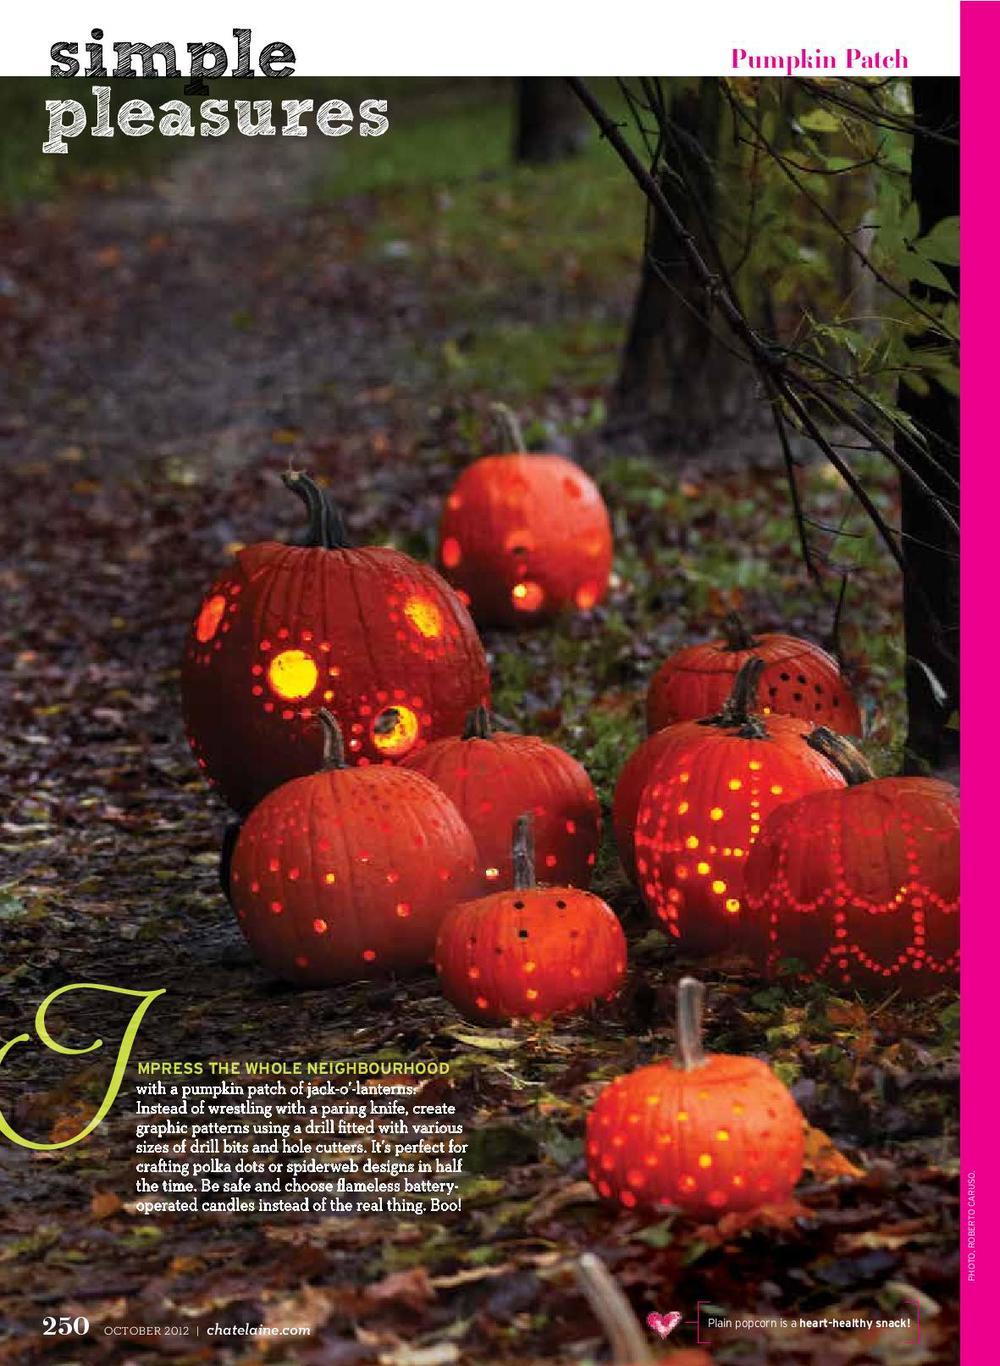 lit pumpkins oct 2012-page-001.jpg